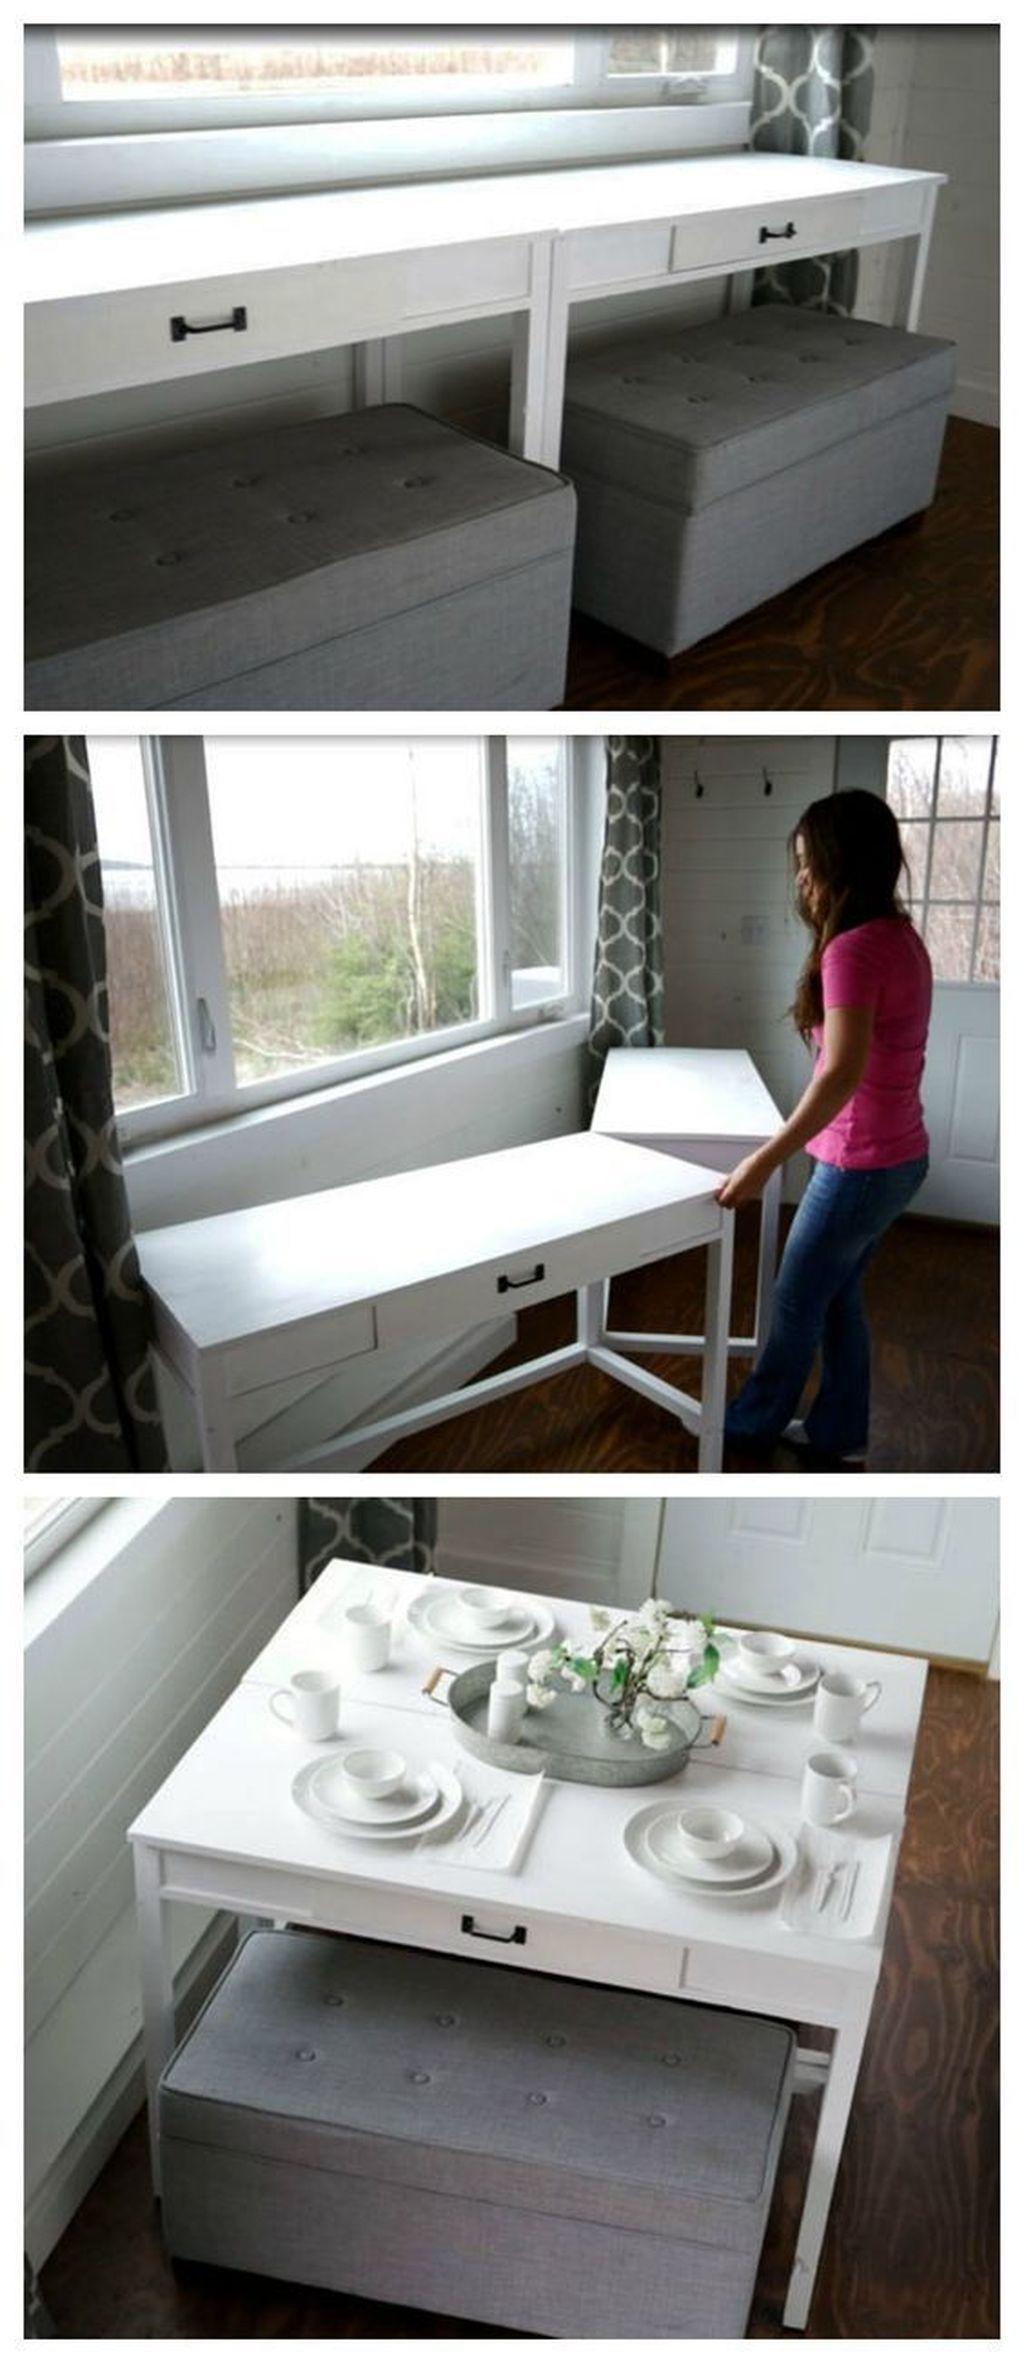 60+ Tiny House Storage Hacks and Ideas | Wohnideen, Minihaus und ...